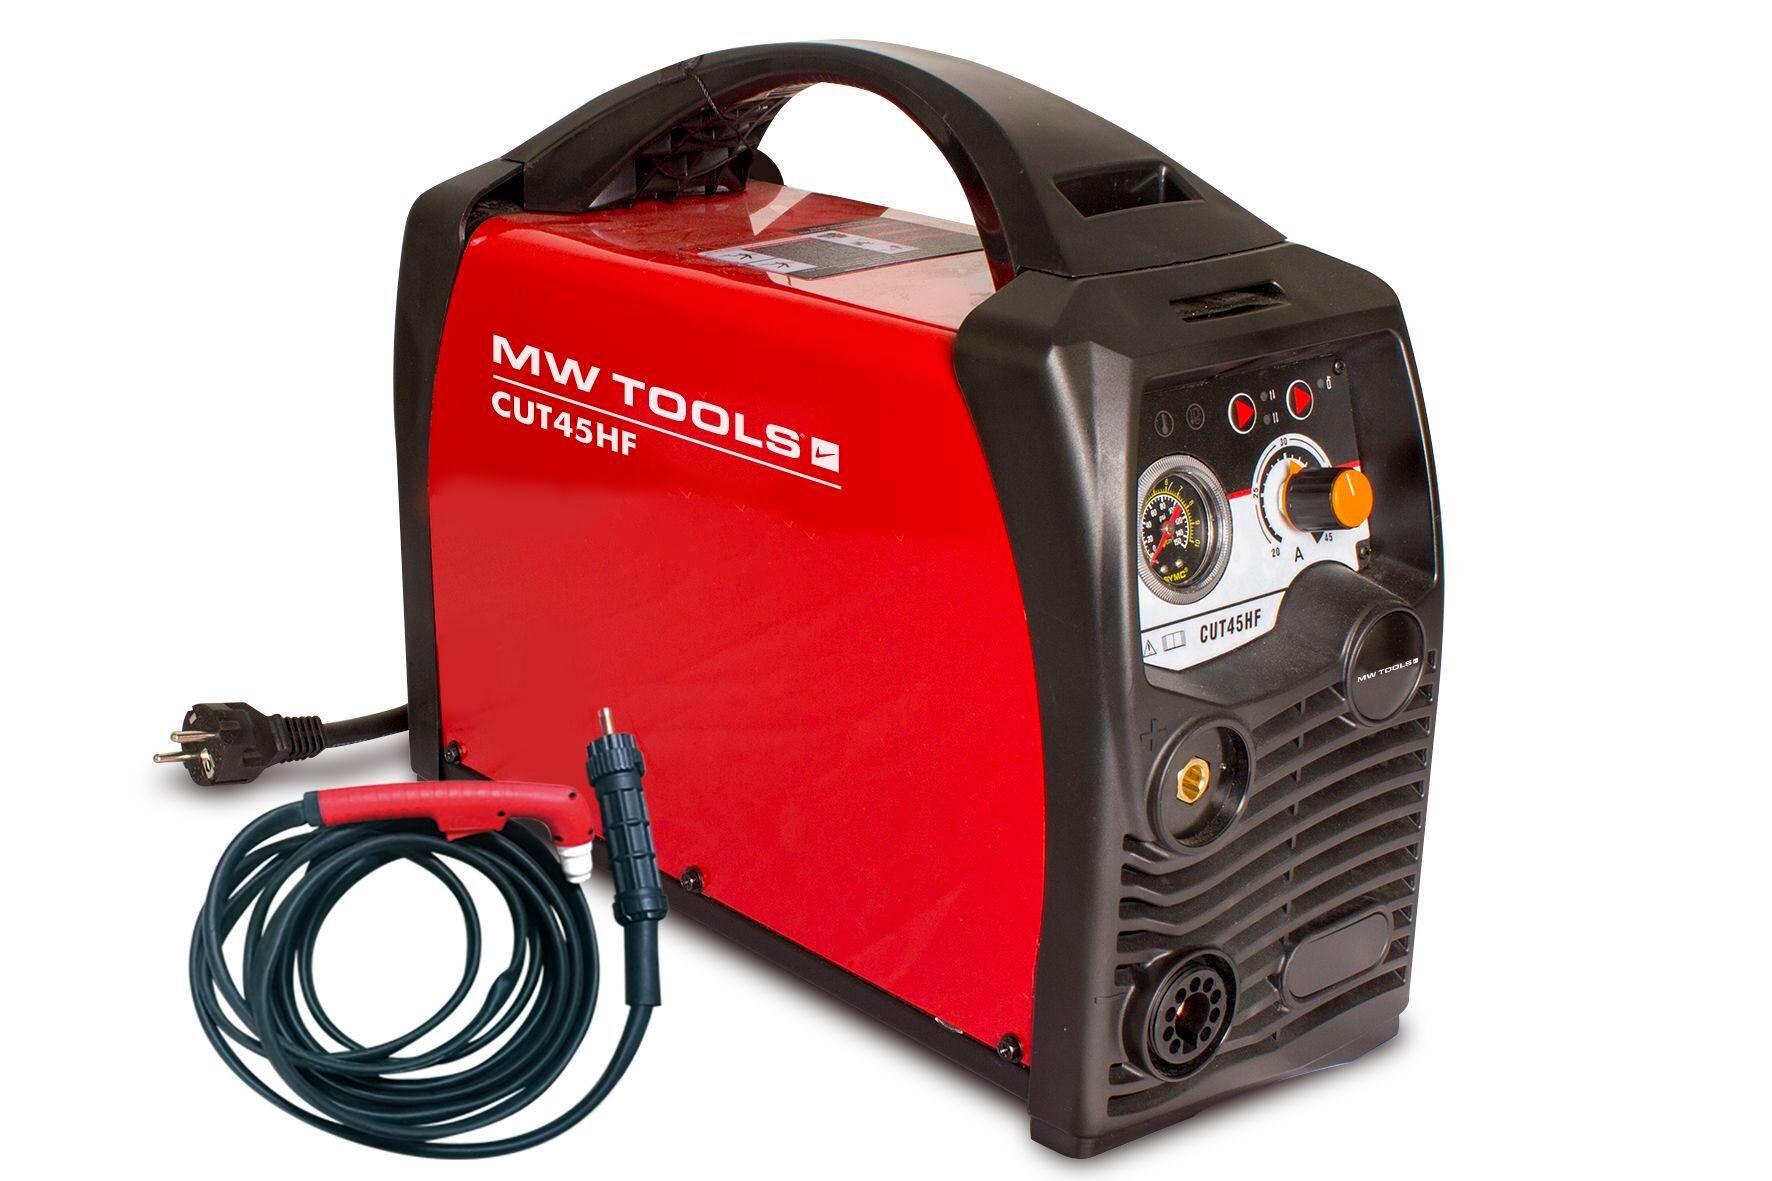 Mw-tools Découpeur plasma portable 45 A MW-Tools CUT45HF